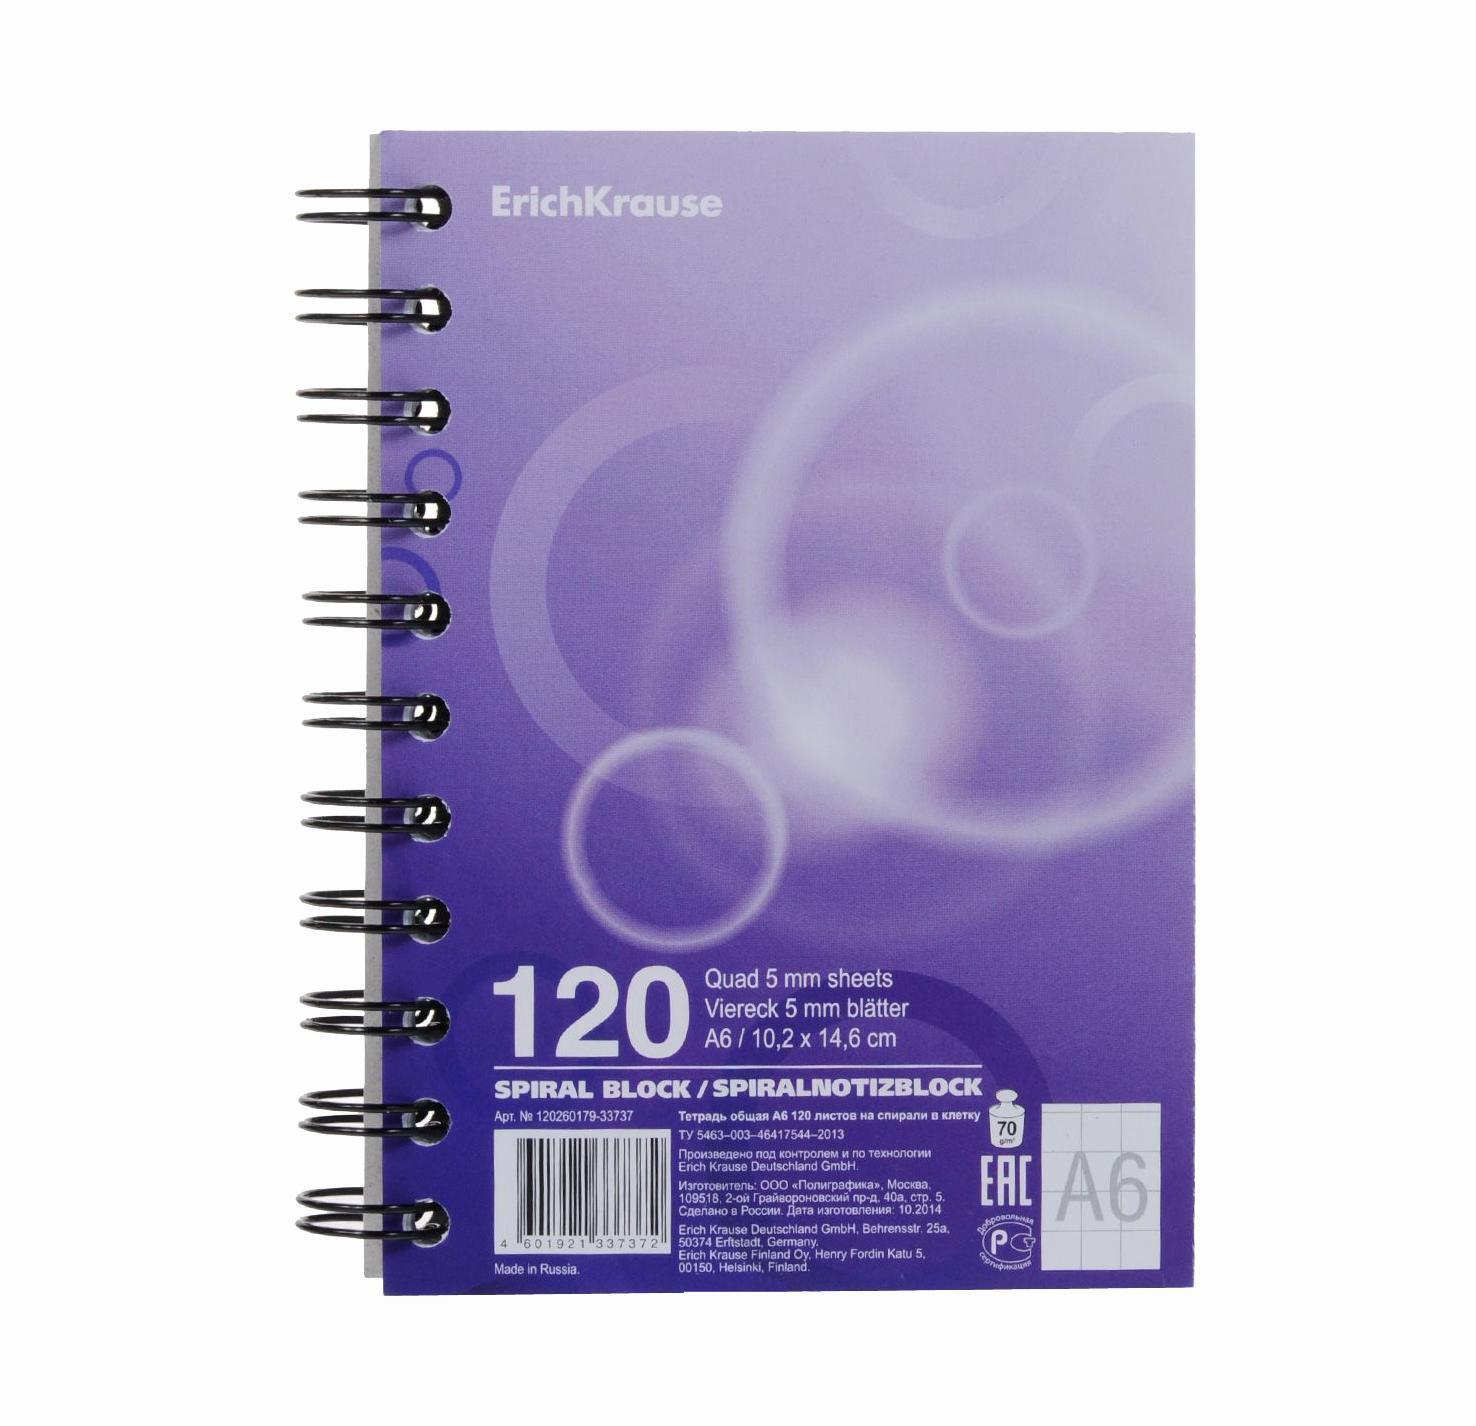 Тетрадь на спирали А6, 120л Spiral Block 3, цвет: фиолетовый33737 фиолетовыйтетрадь на спирали А6,120л Spiral Block 3, цвет: фиолетовый